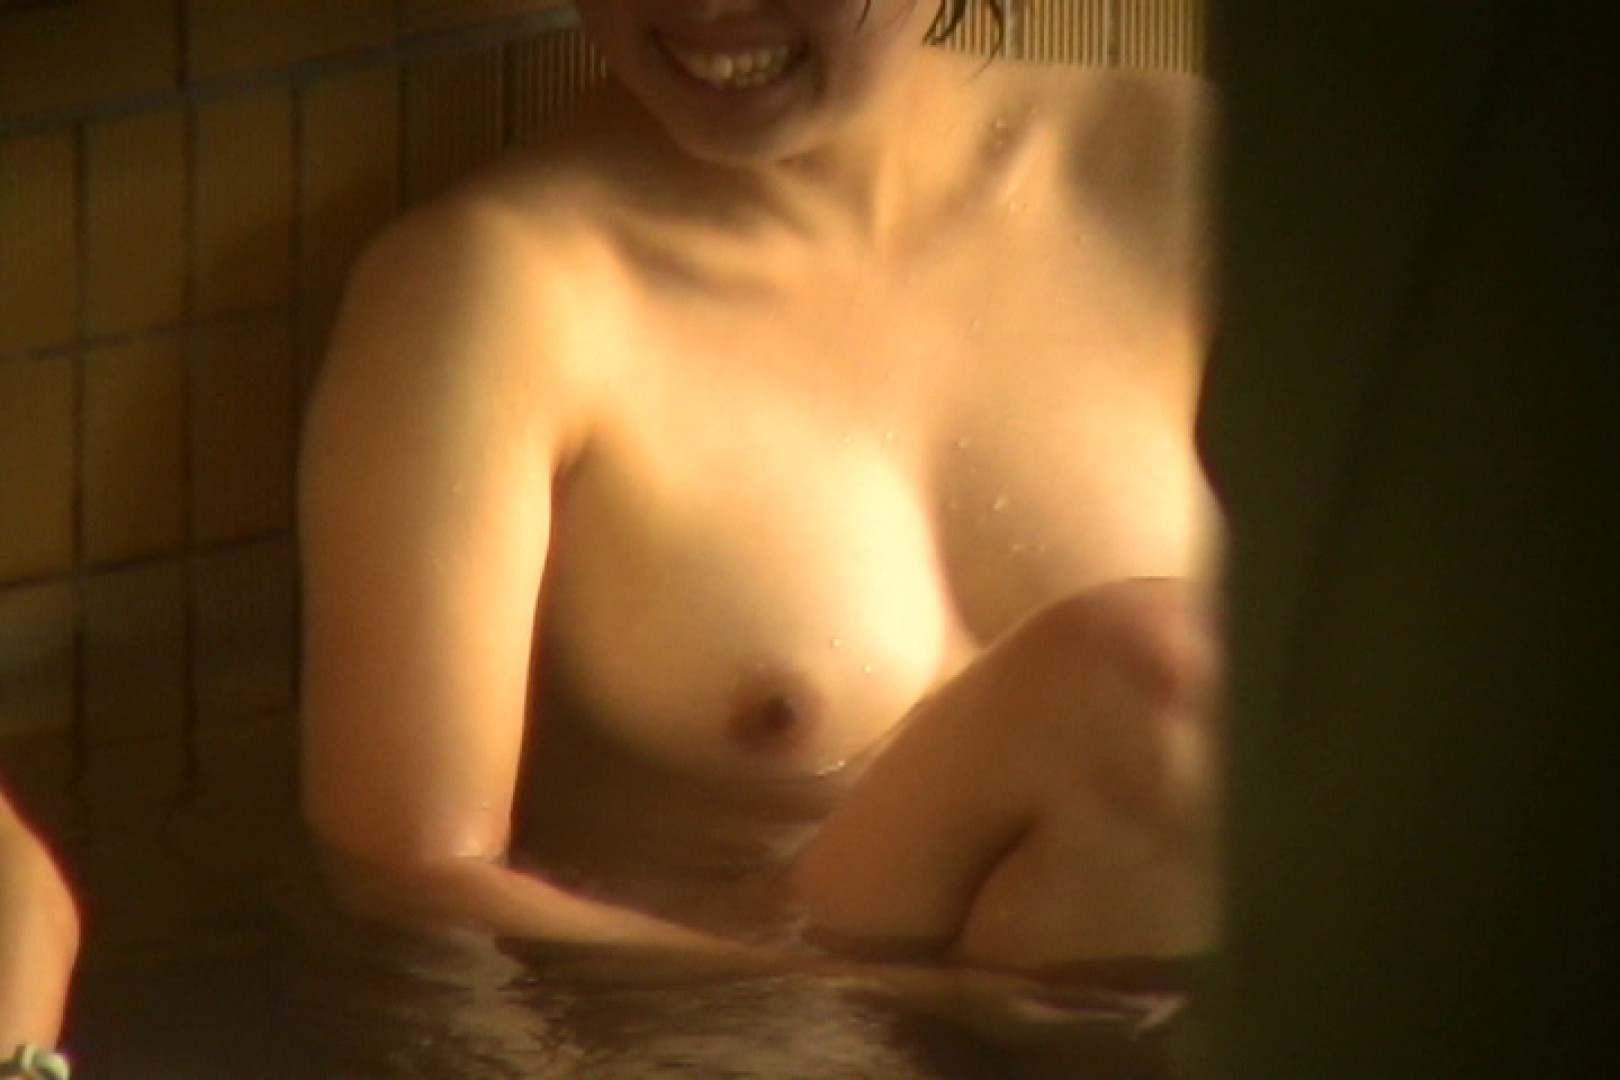 Aquaな露天風呂Vol.704 OLのエロ生活 | 露天風呂  38連発 22